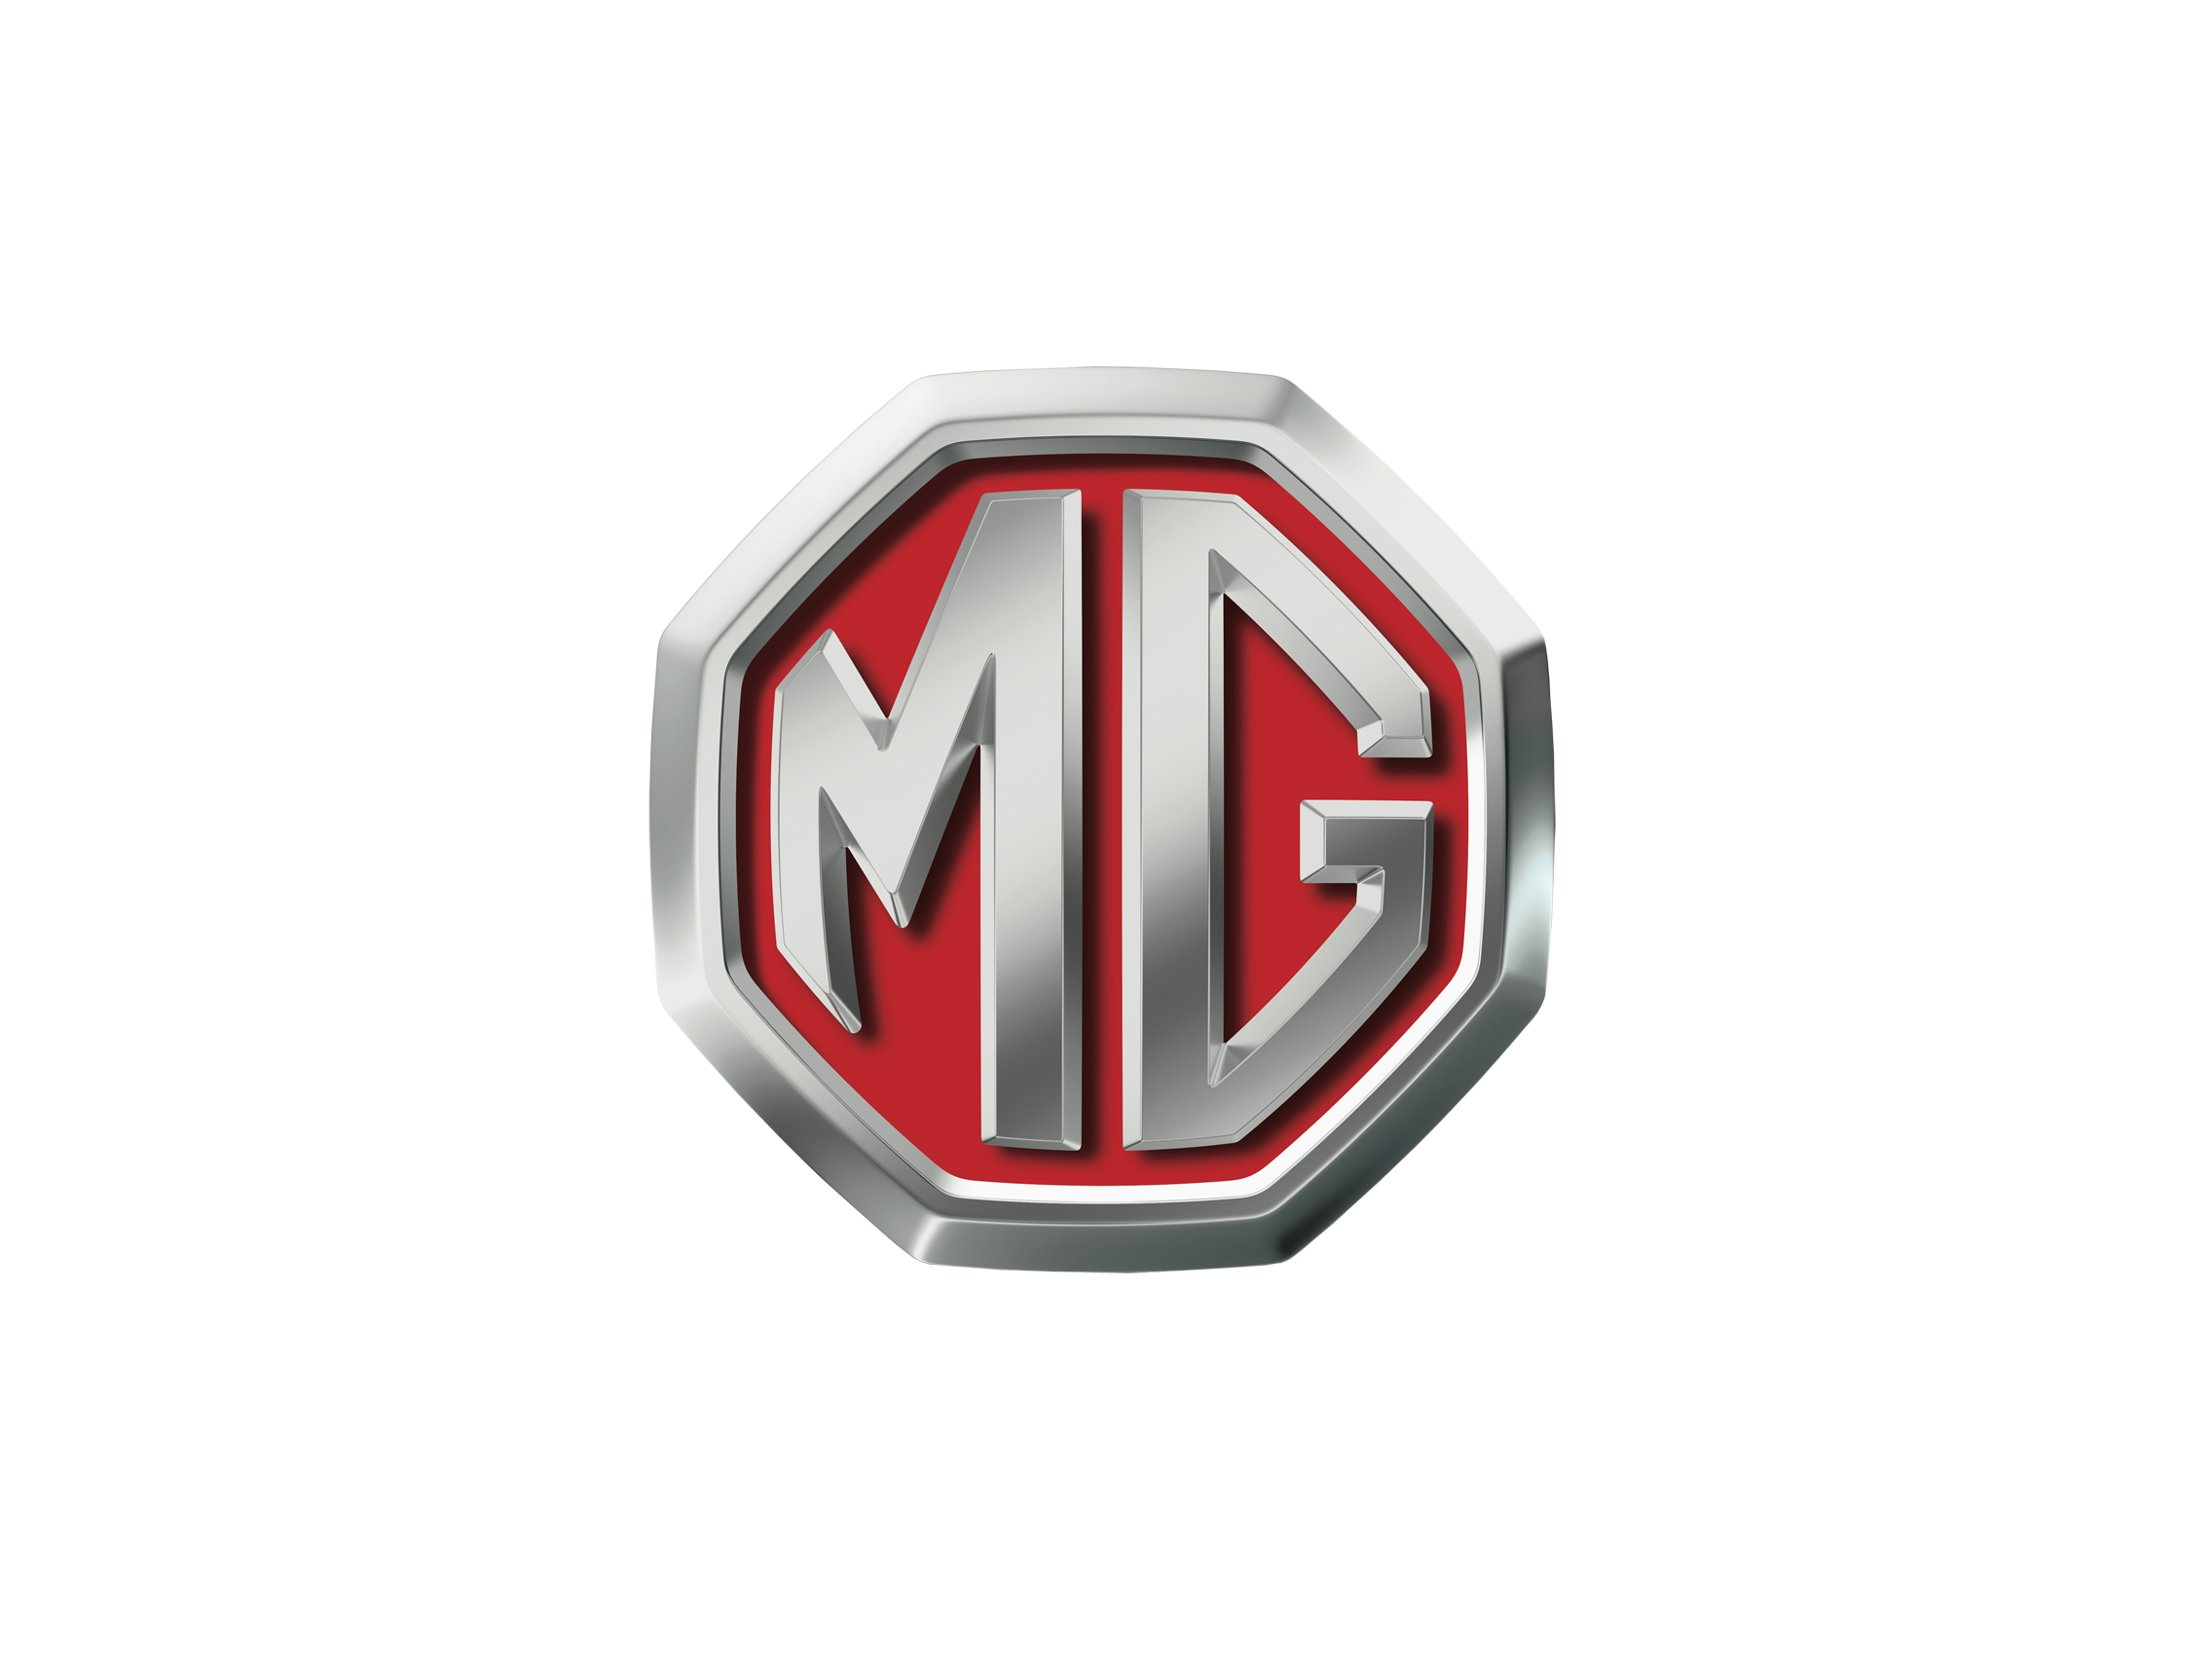 mg logo hd png meaning information carlogos org rh carlogos org hd logos of pakistani institutions hd logistics